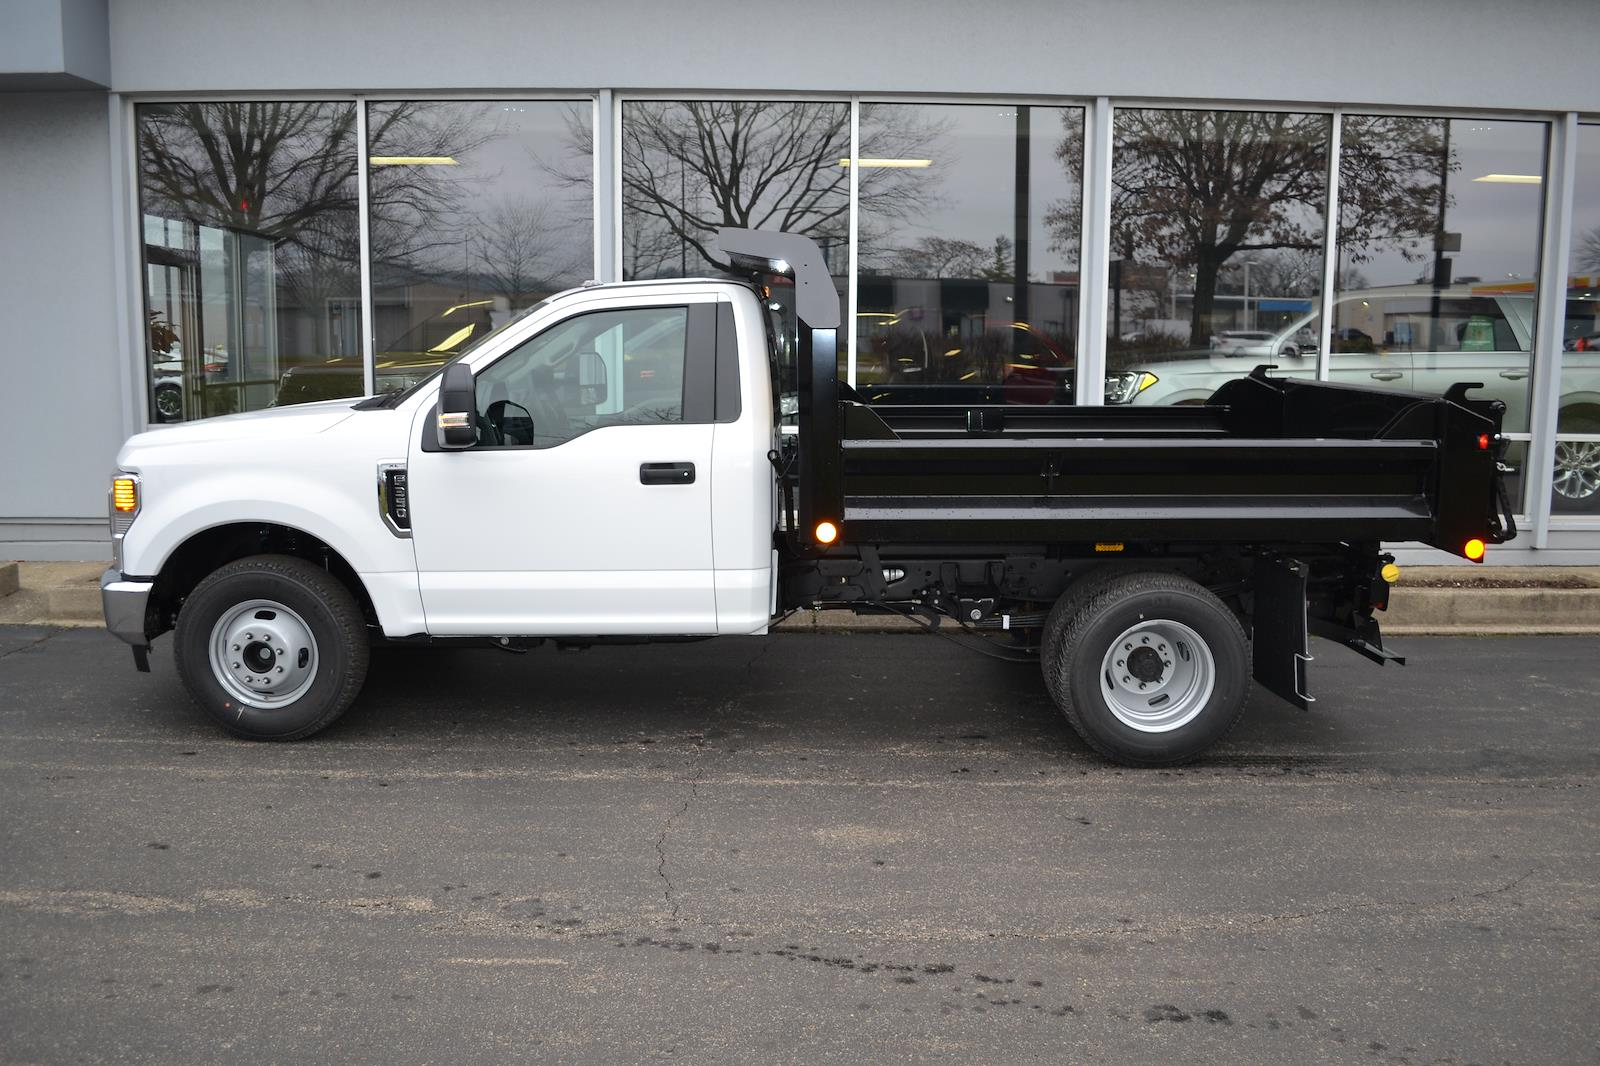 2021 Ford F-350 Regular Cab DRW 4x2, Crysteel Dump Body #B126 - photo 1